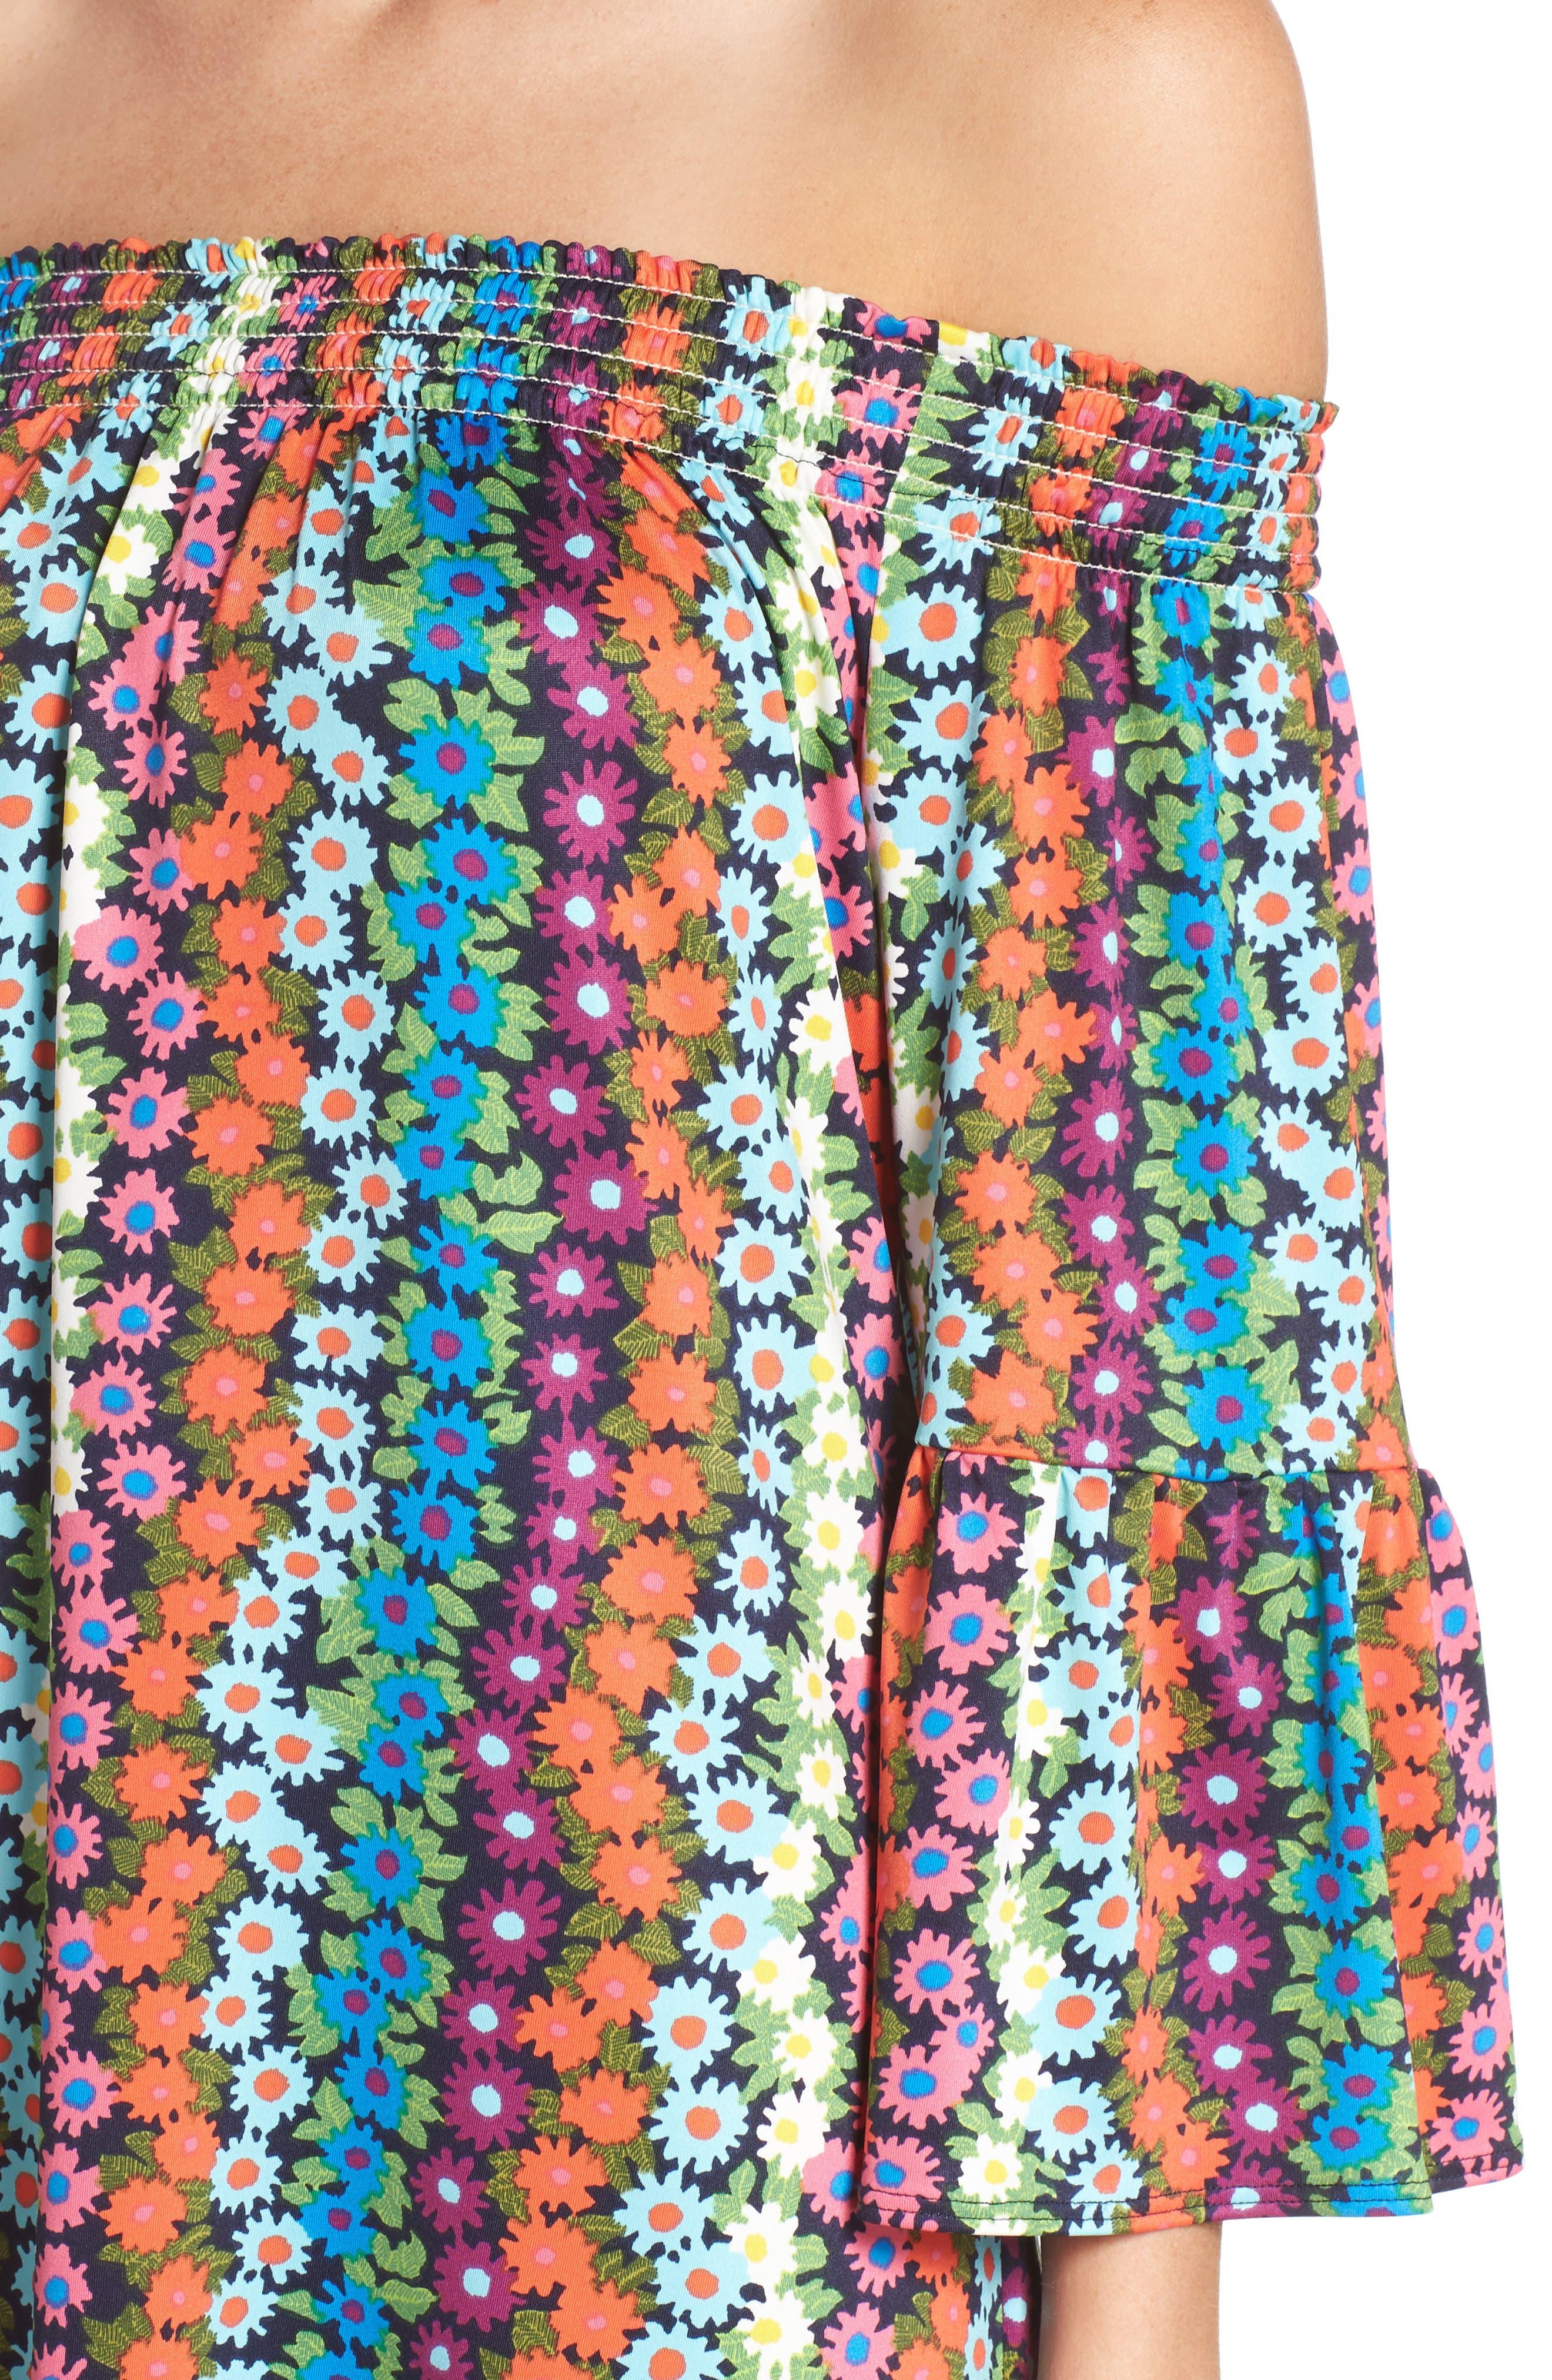 Trina Turk Off the Shoulder Bell Sleeve Dress,                             Alternate thumbnail 4, color,                             Multi